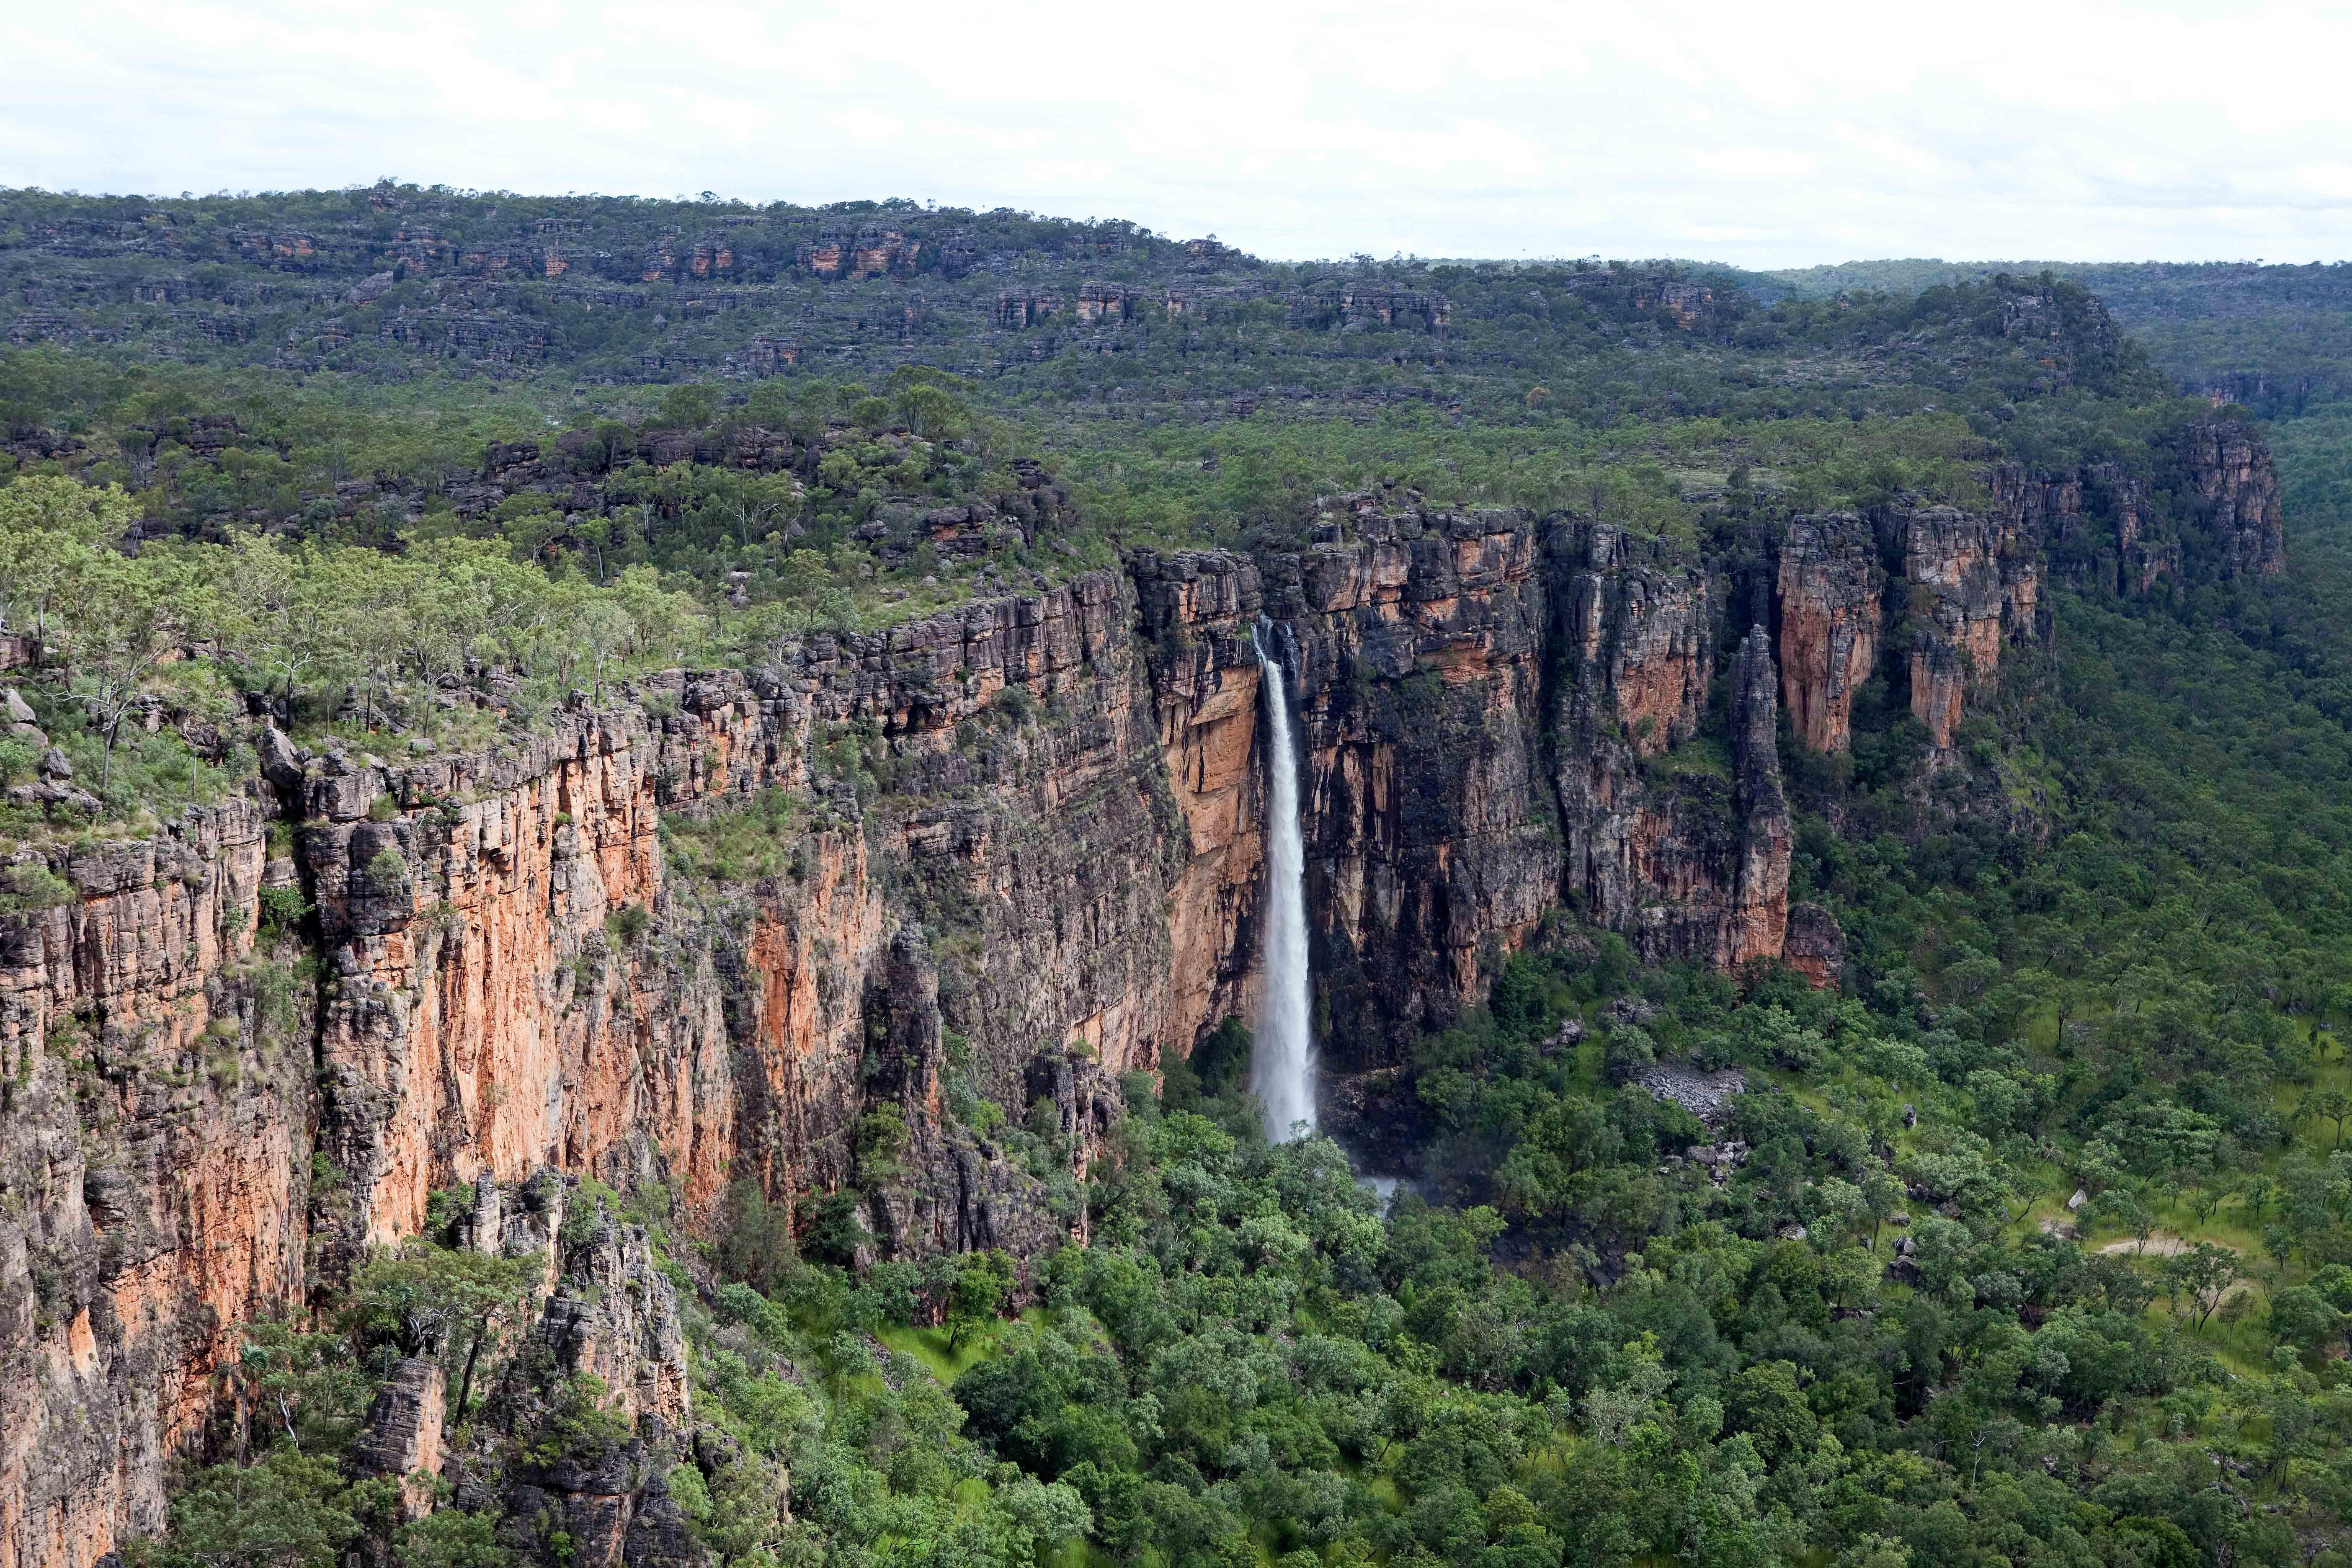 Kakadu National Park Backgrounds on Wallpapers Vista